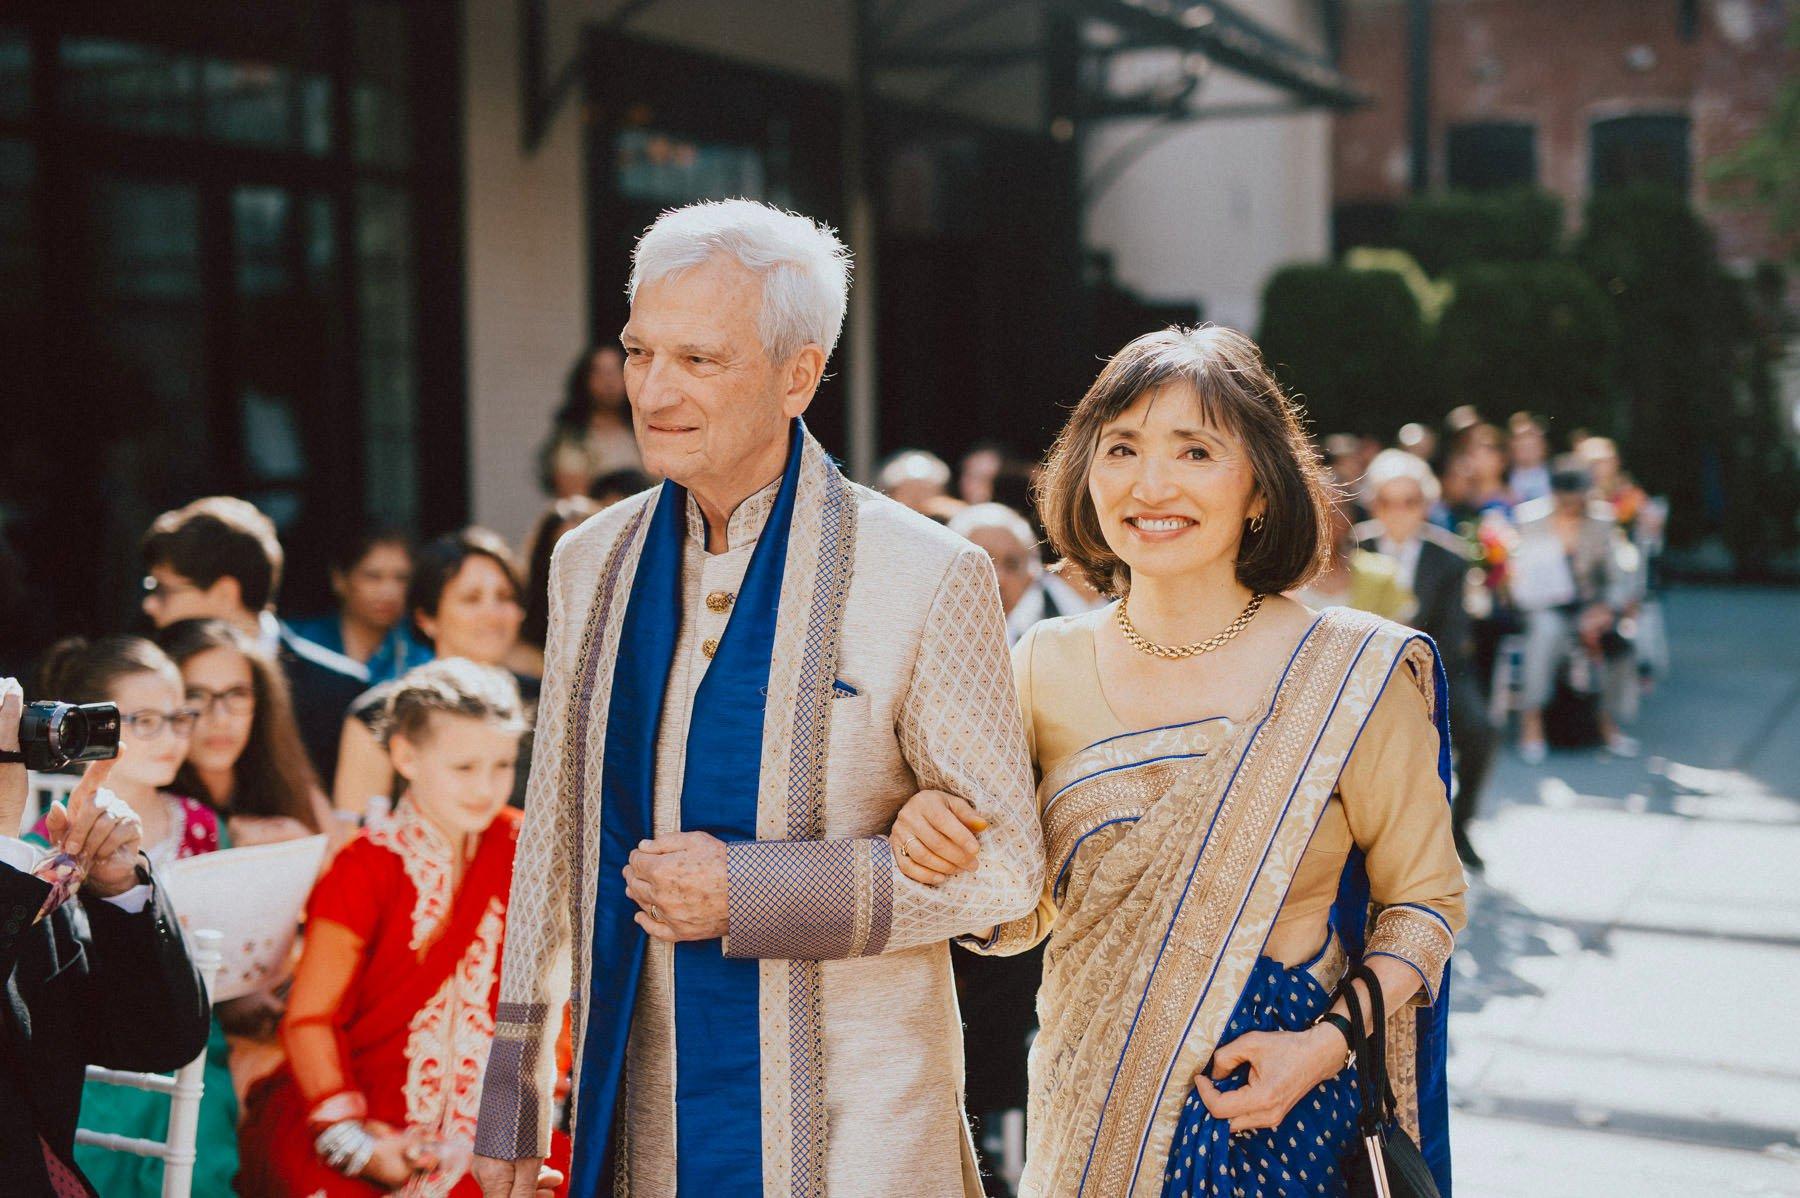 vie-philadelphia-indian-wedding-72.jpg